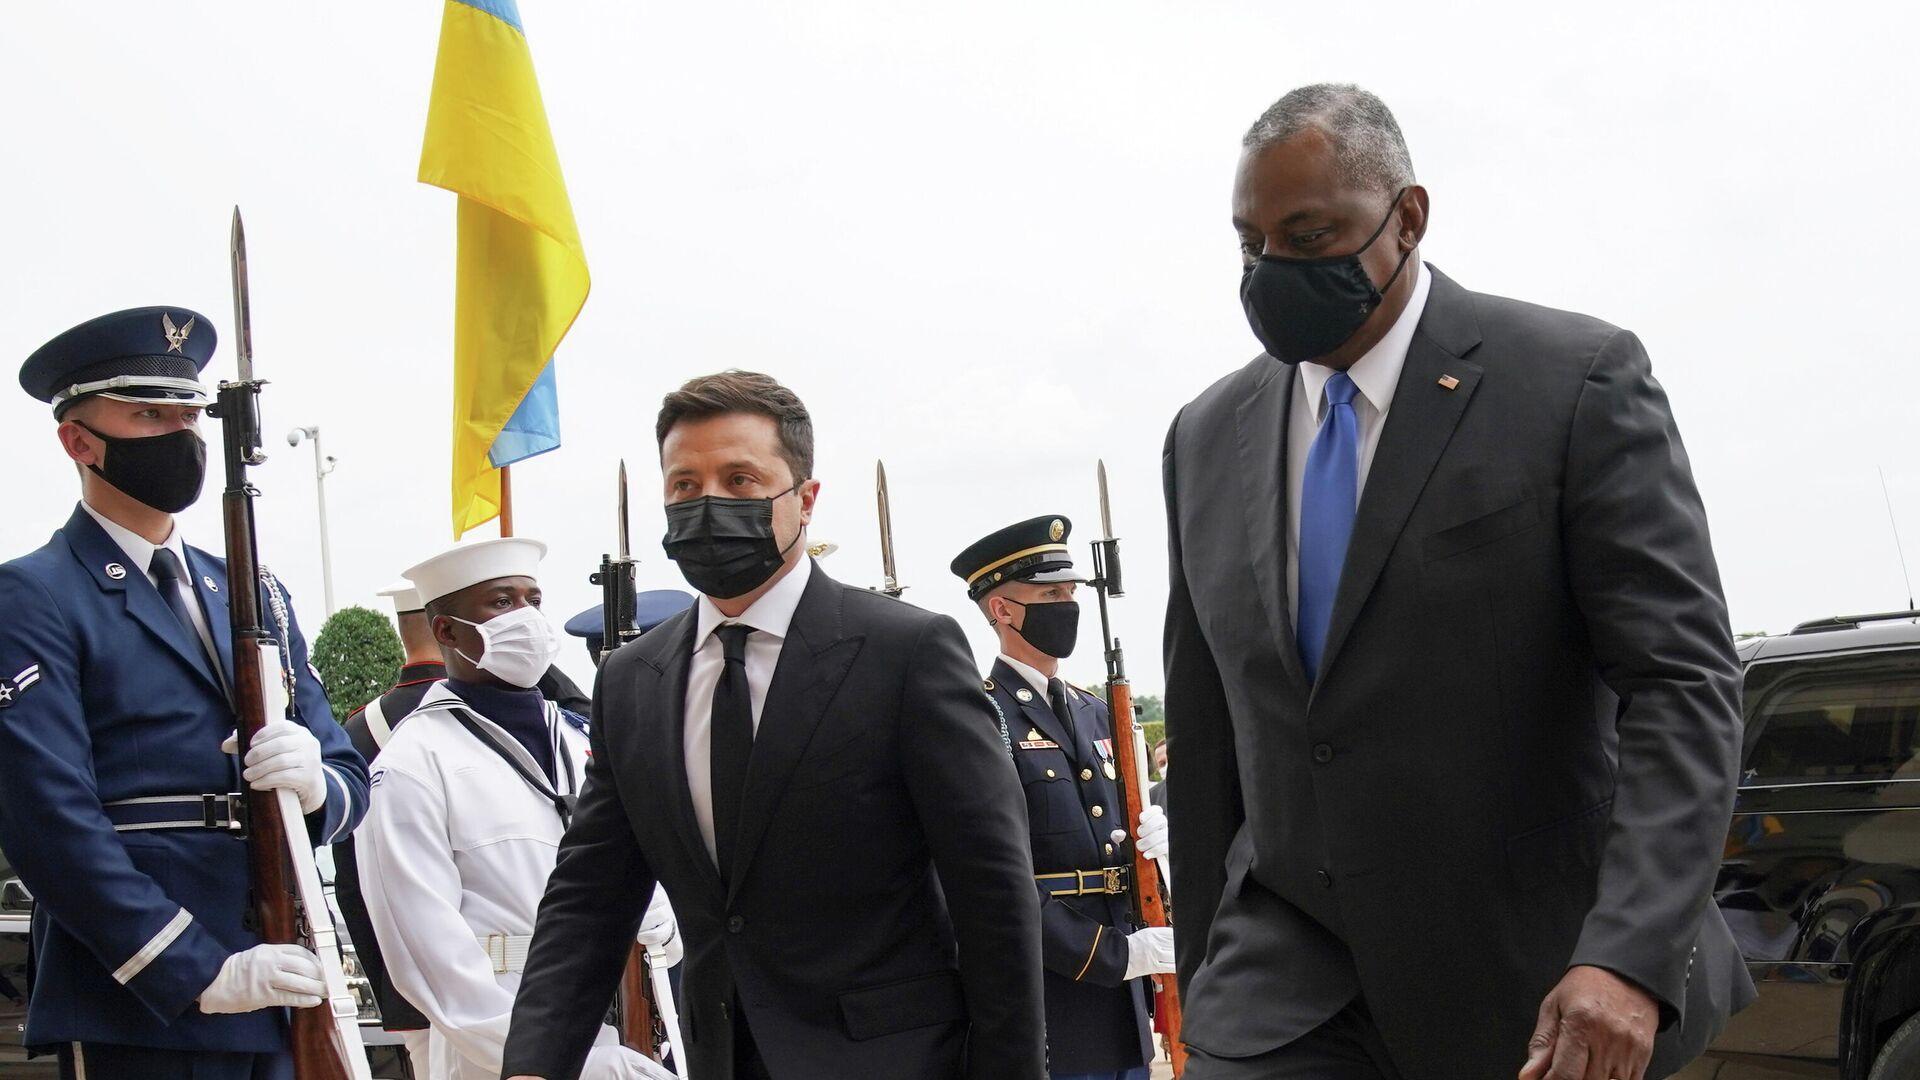 US-Verteidigungsminister Lloyd Austin begleitet den ukrainischen Präsidenten Wladimir Selenski in das Pentagon in Arlington, Virginia, USA, den 31. August 2021.  - SNA, 1920, 01.09.2021